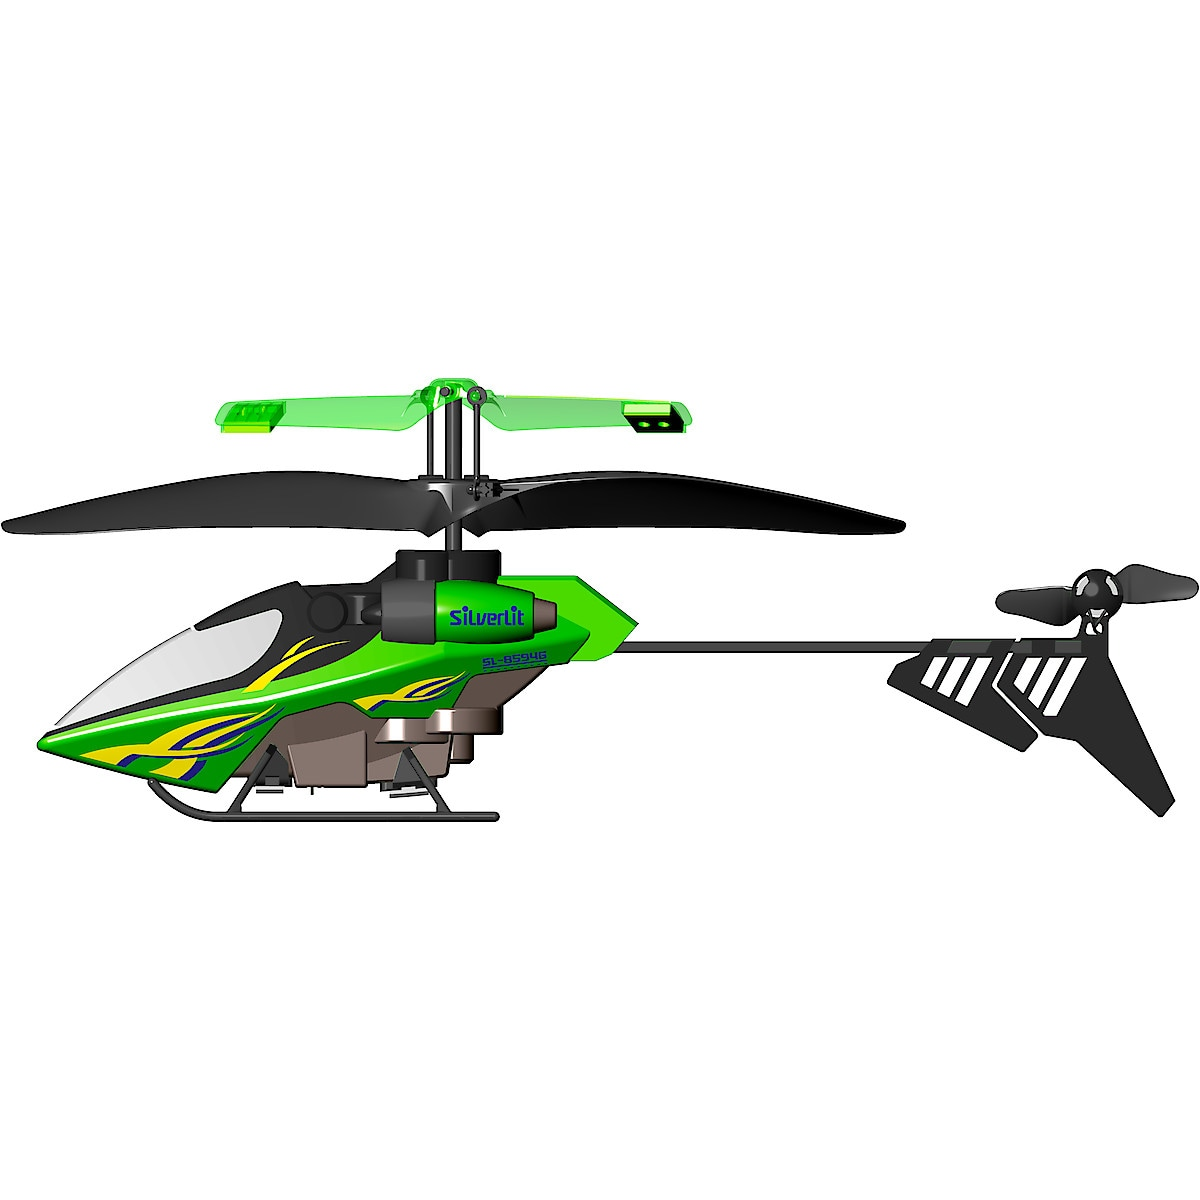 Helikopter, Silverlit PiccoZ Airbullet